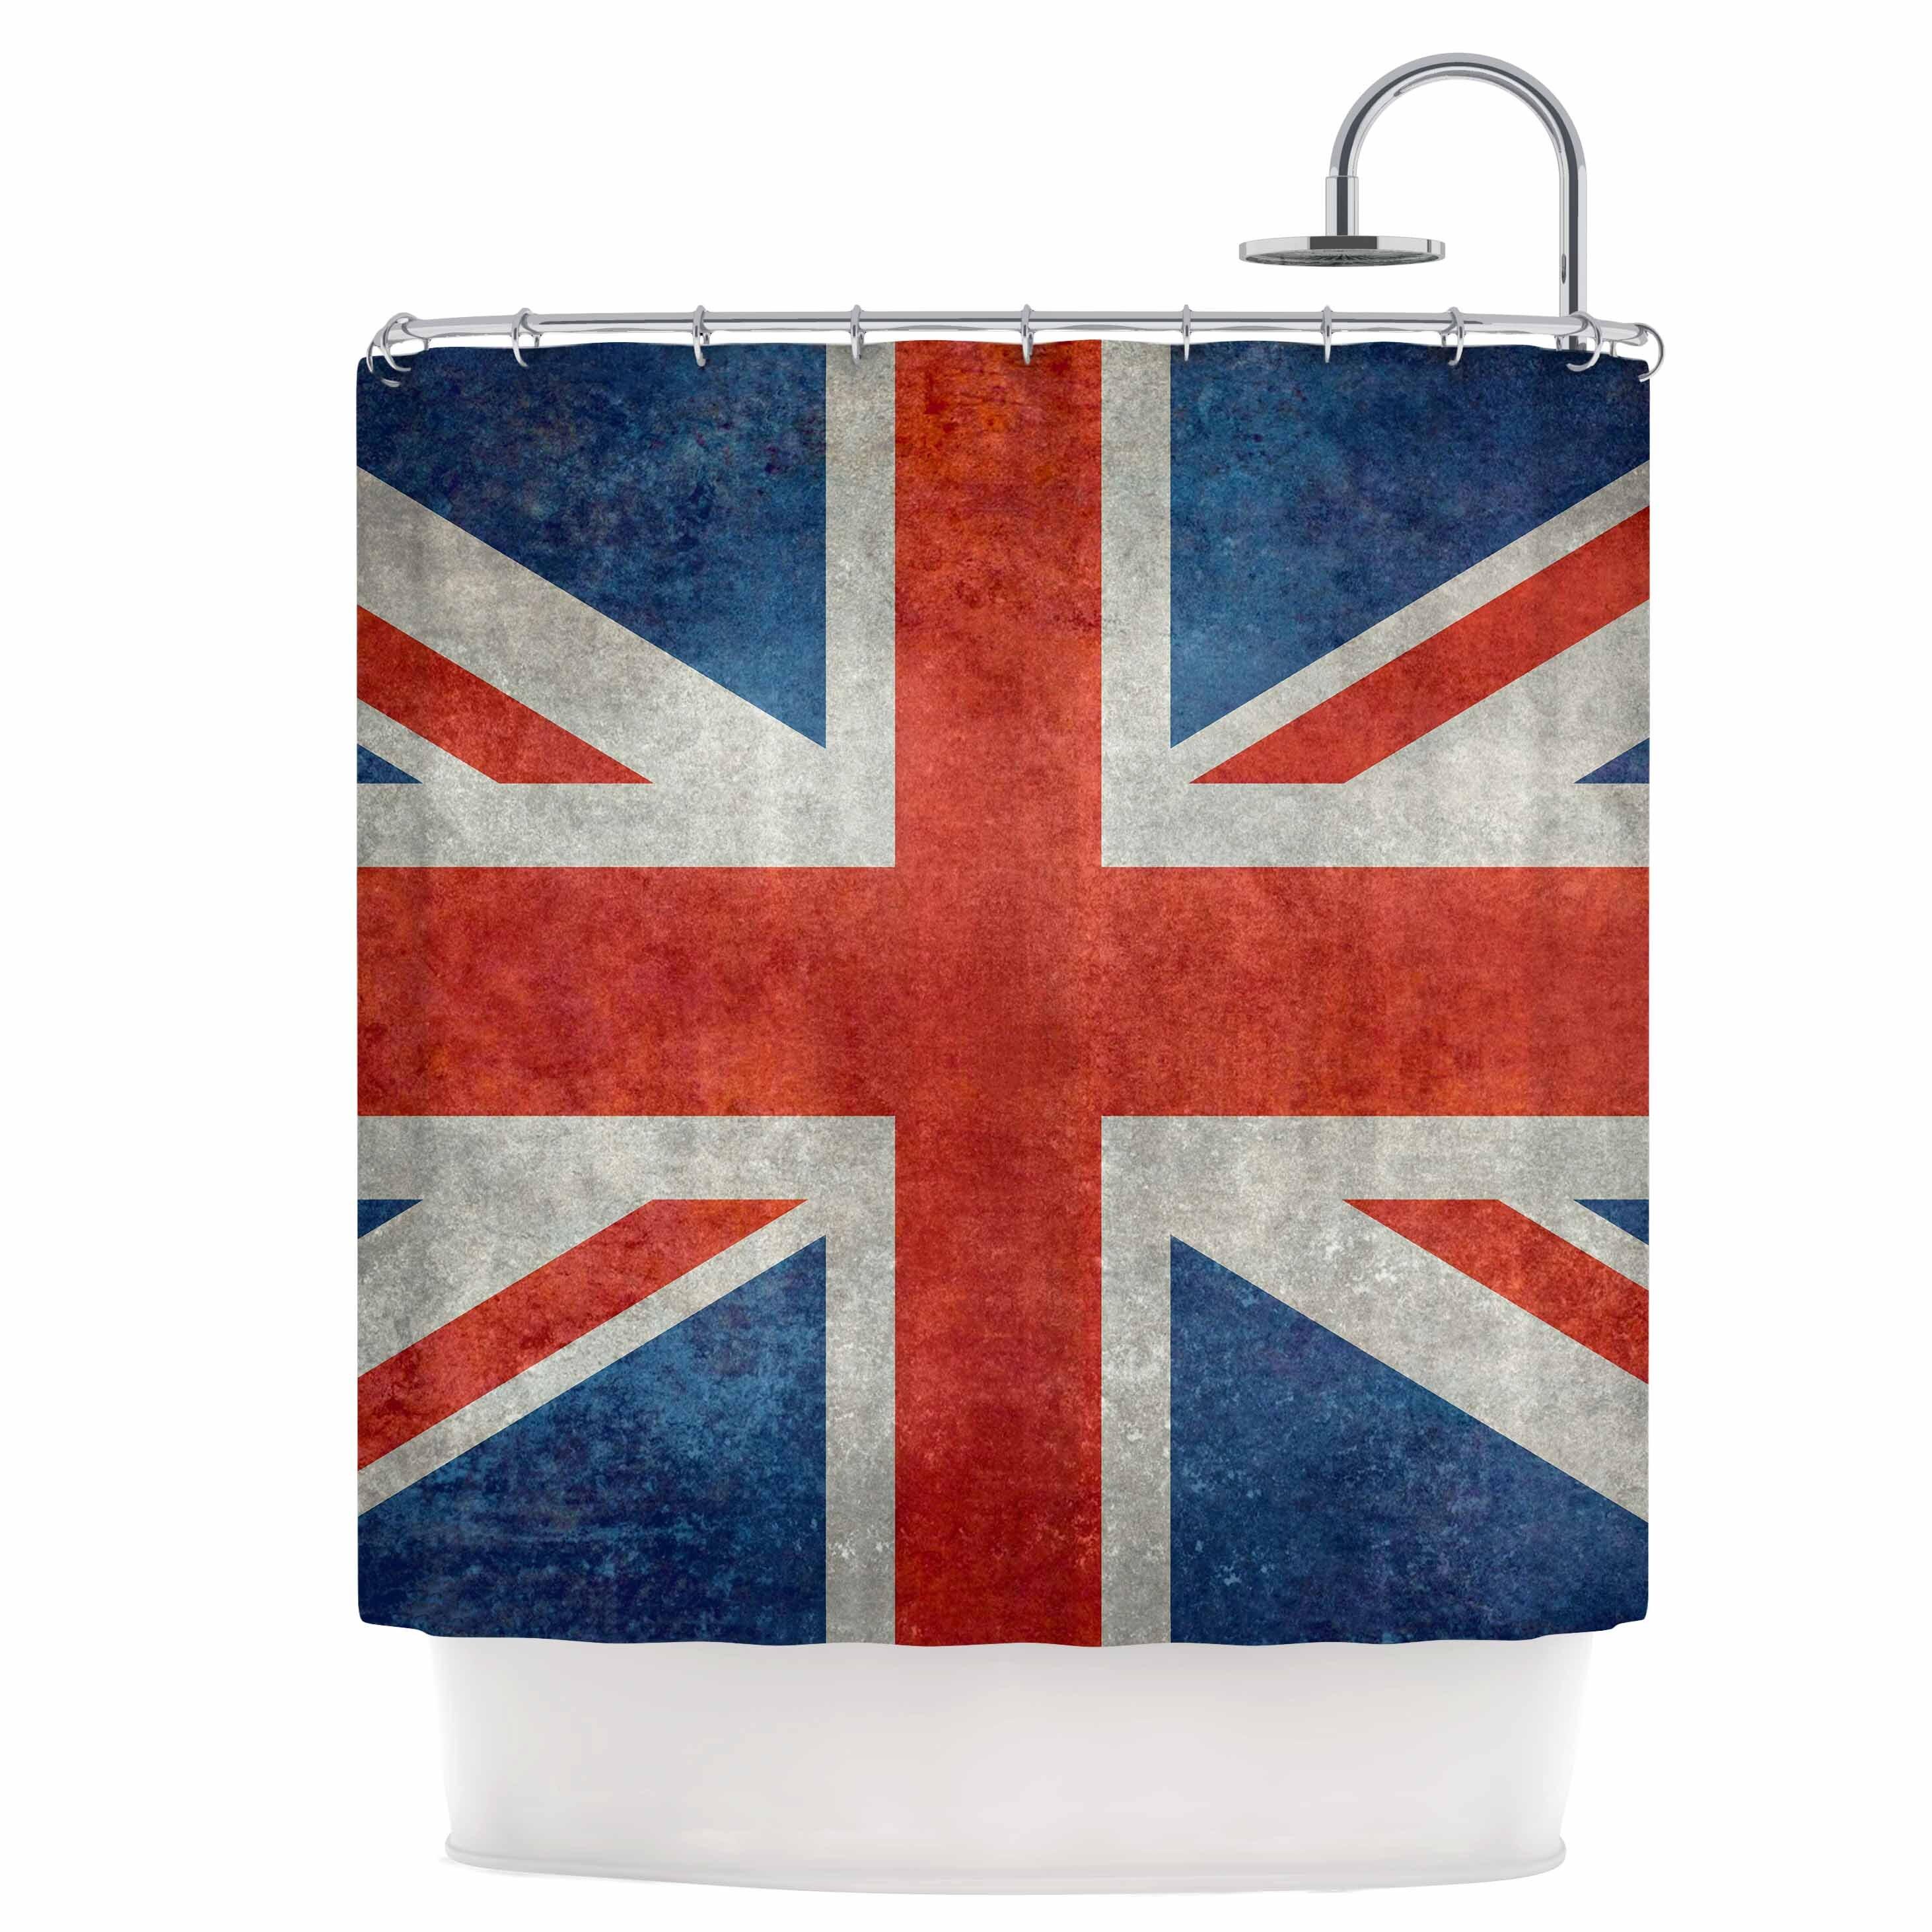 Kess Inhouse Uk Union Jack Flag Shower Curtain Wayfair